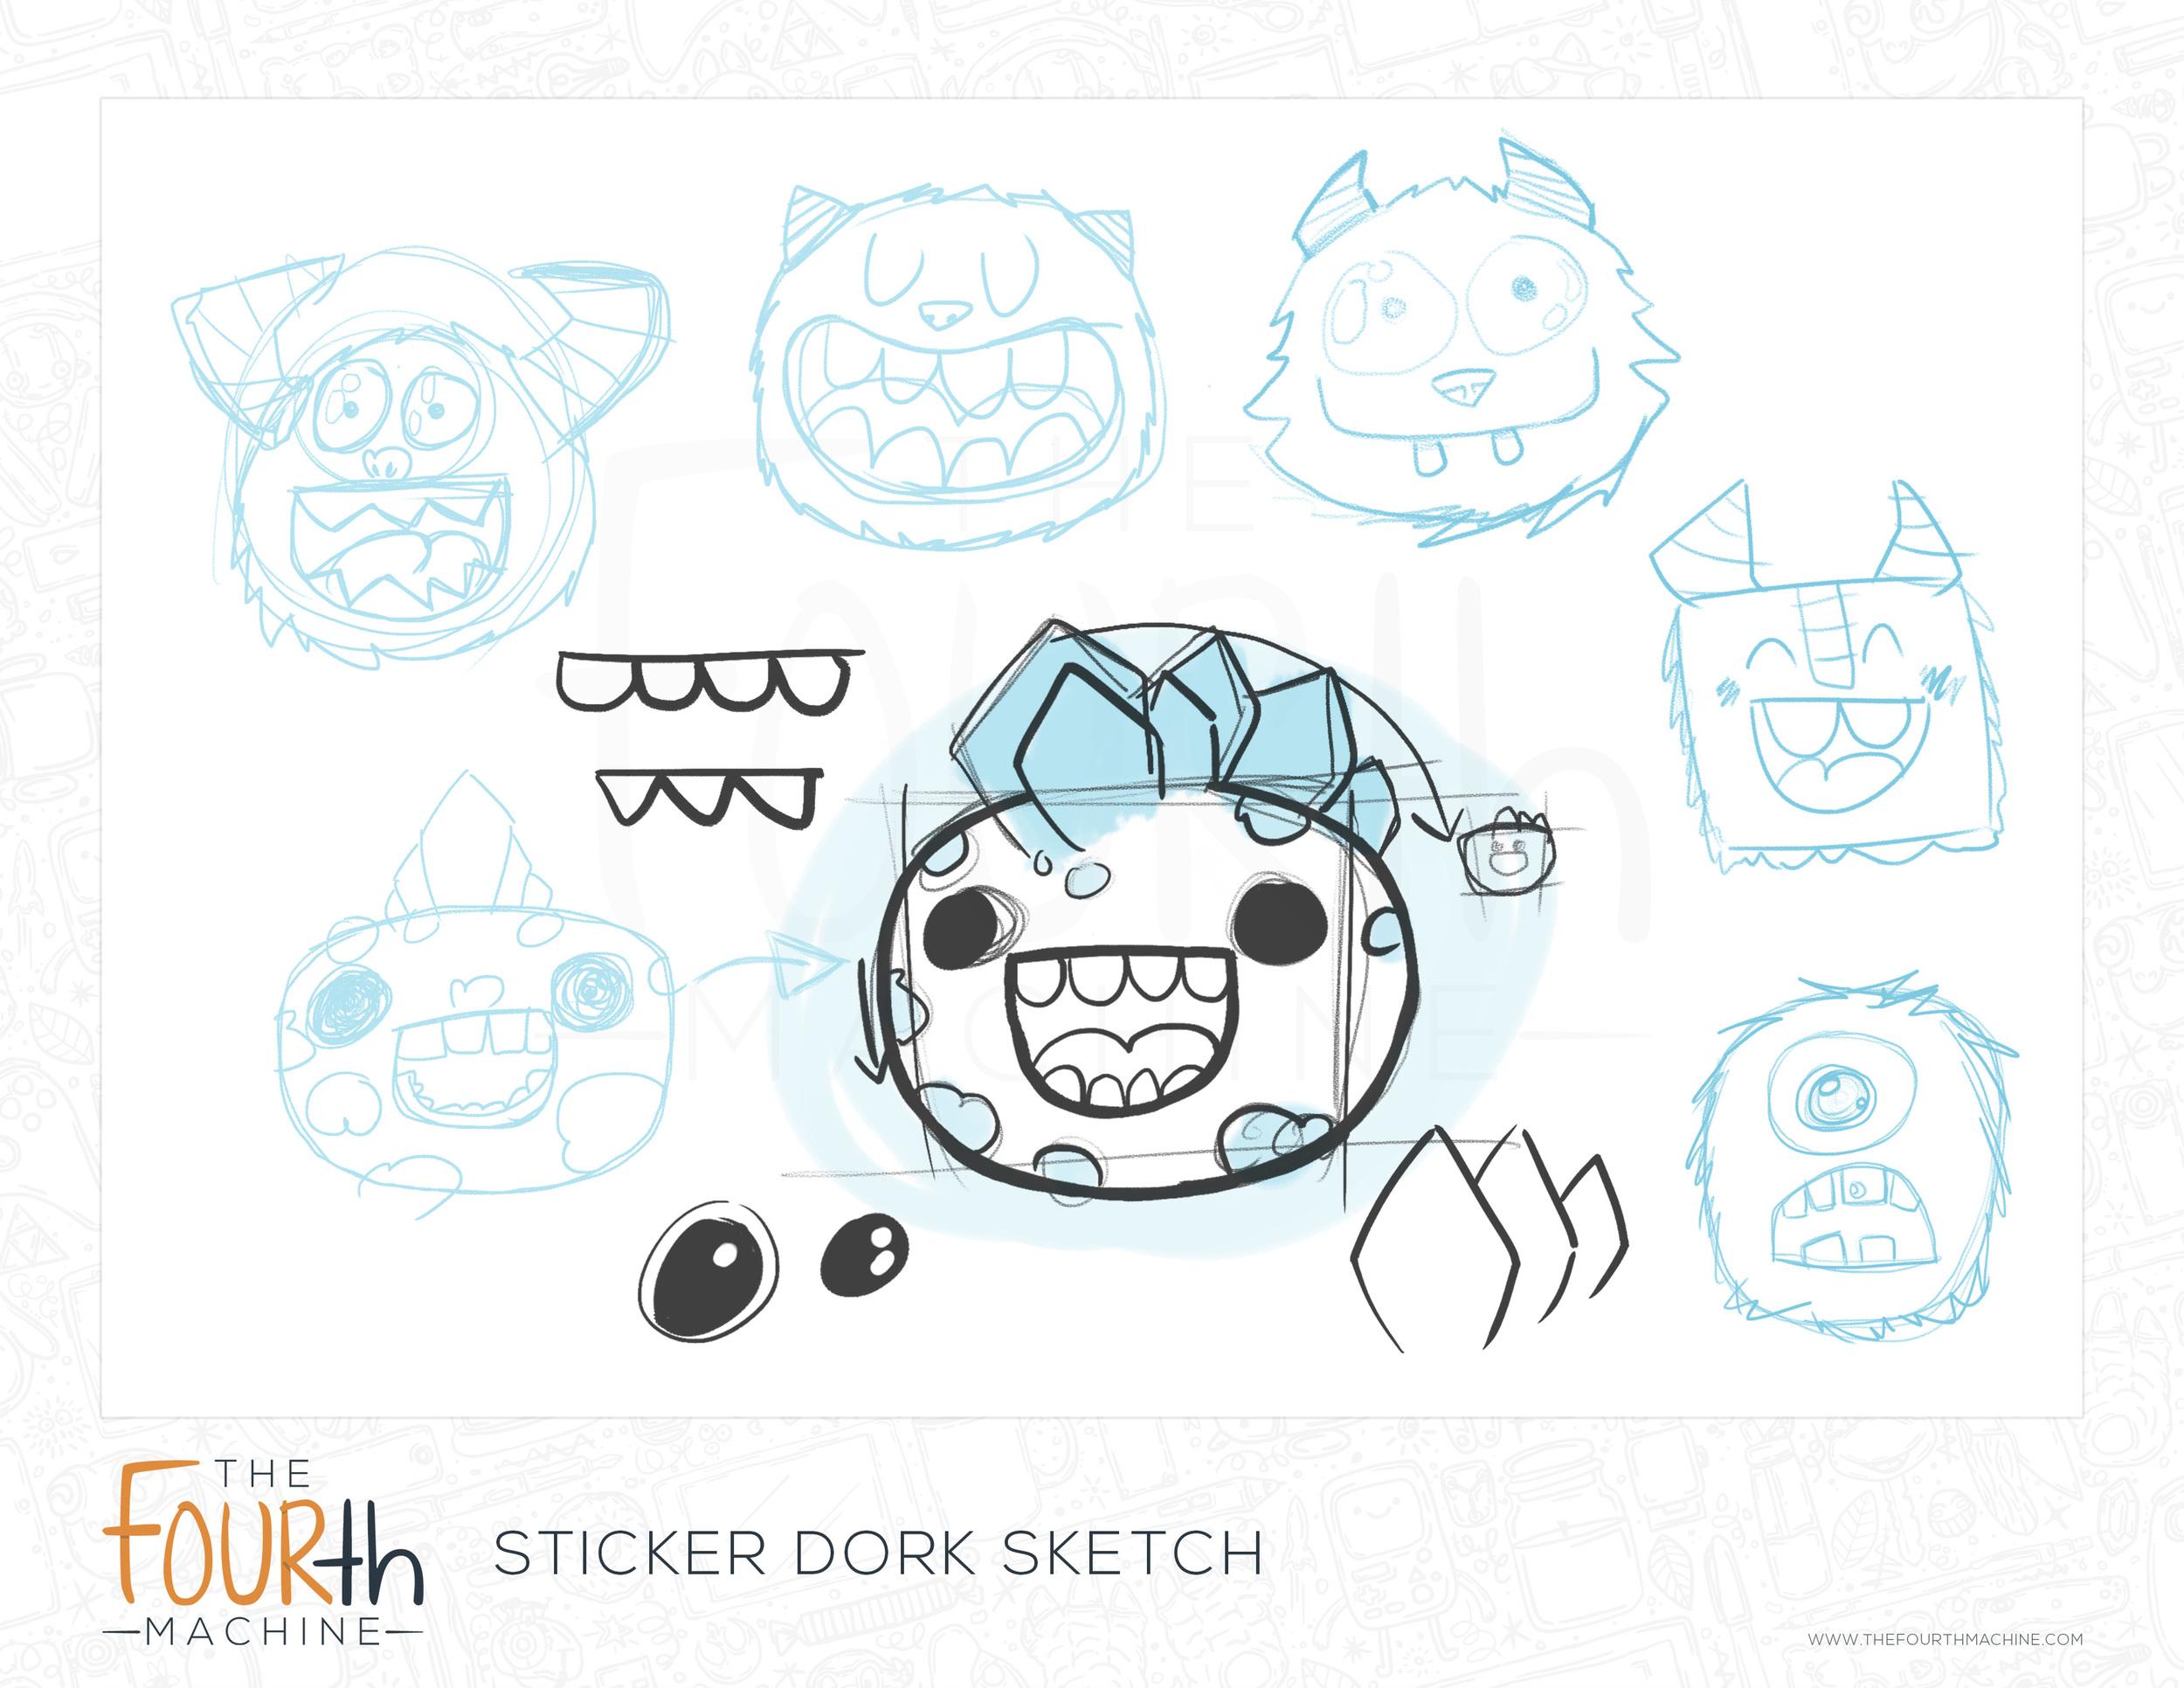 Sticker Dork Sketch.jpg